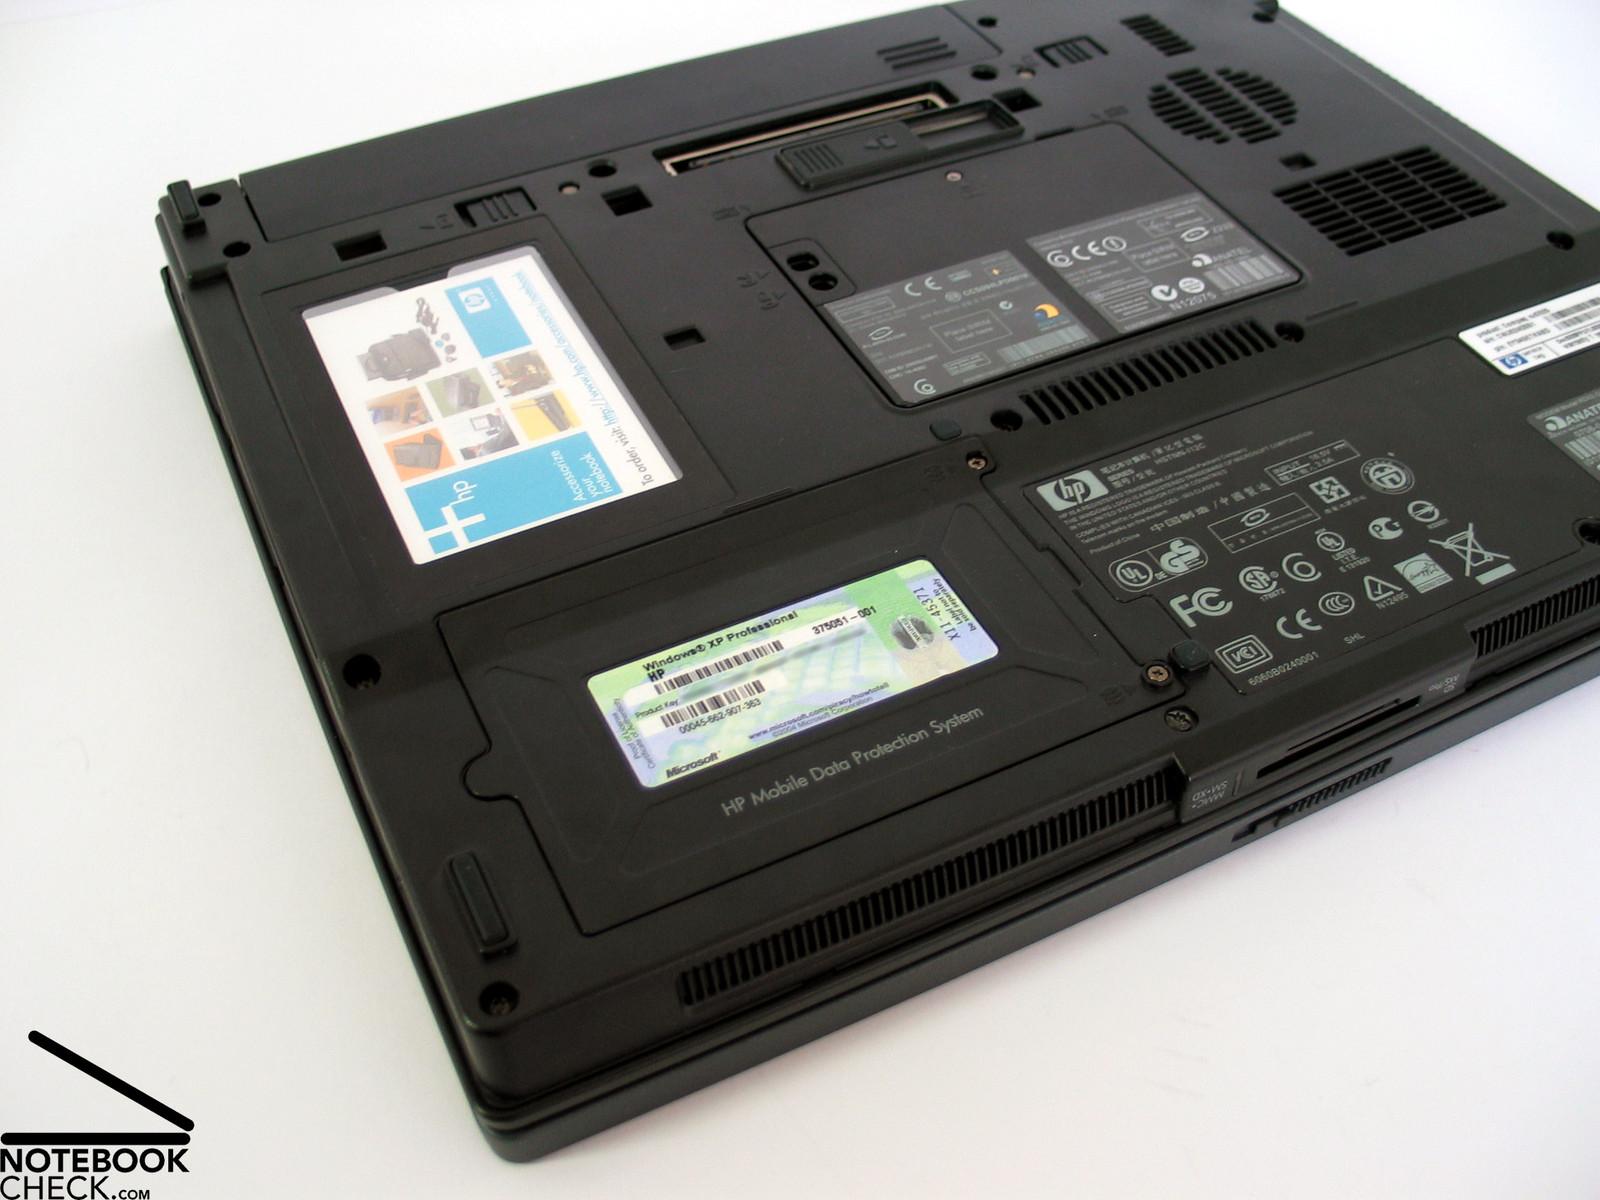 HP COMPAQ NX6325 NOTEBOOK TEXAS INSTRUMENTS CARD READER DRIVER FOR MAC DOWNLOAD